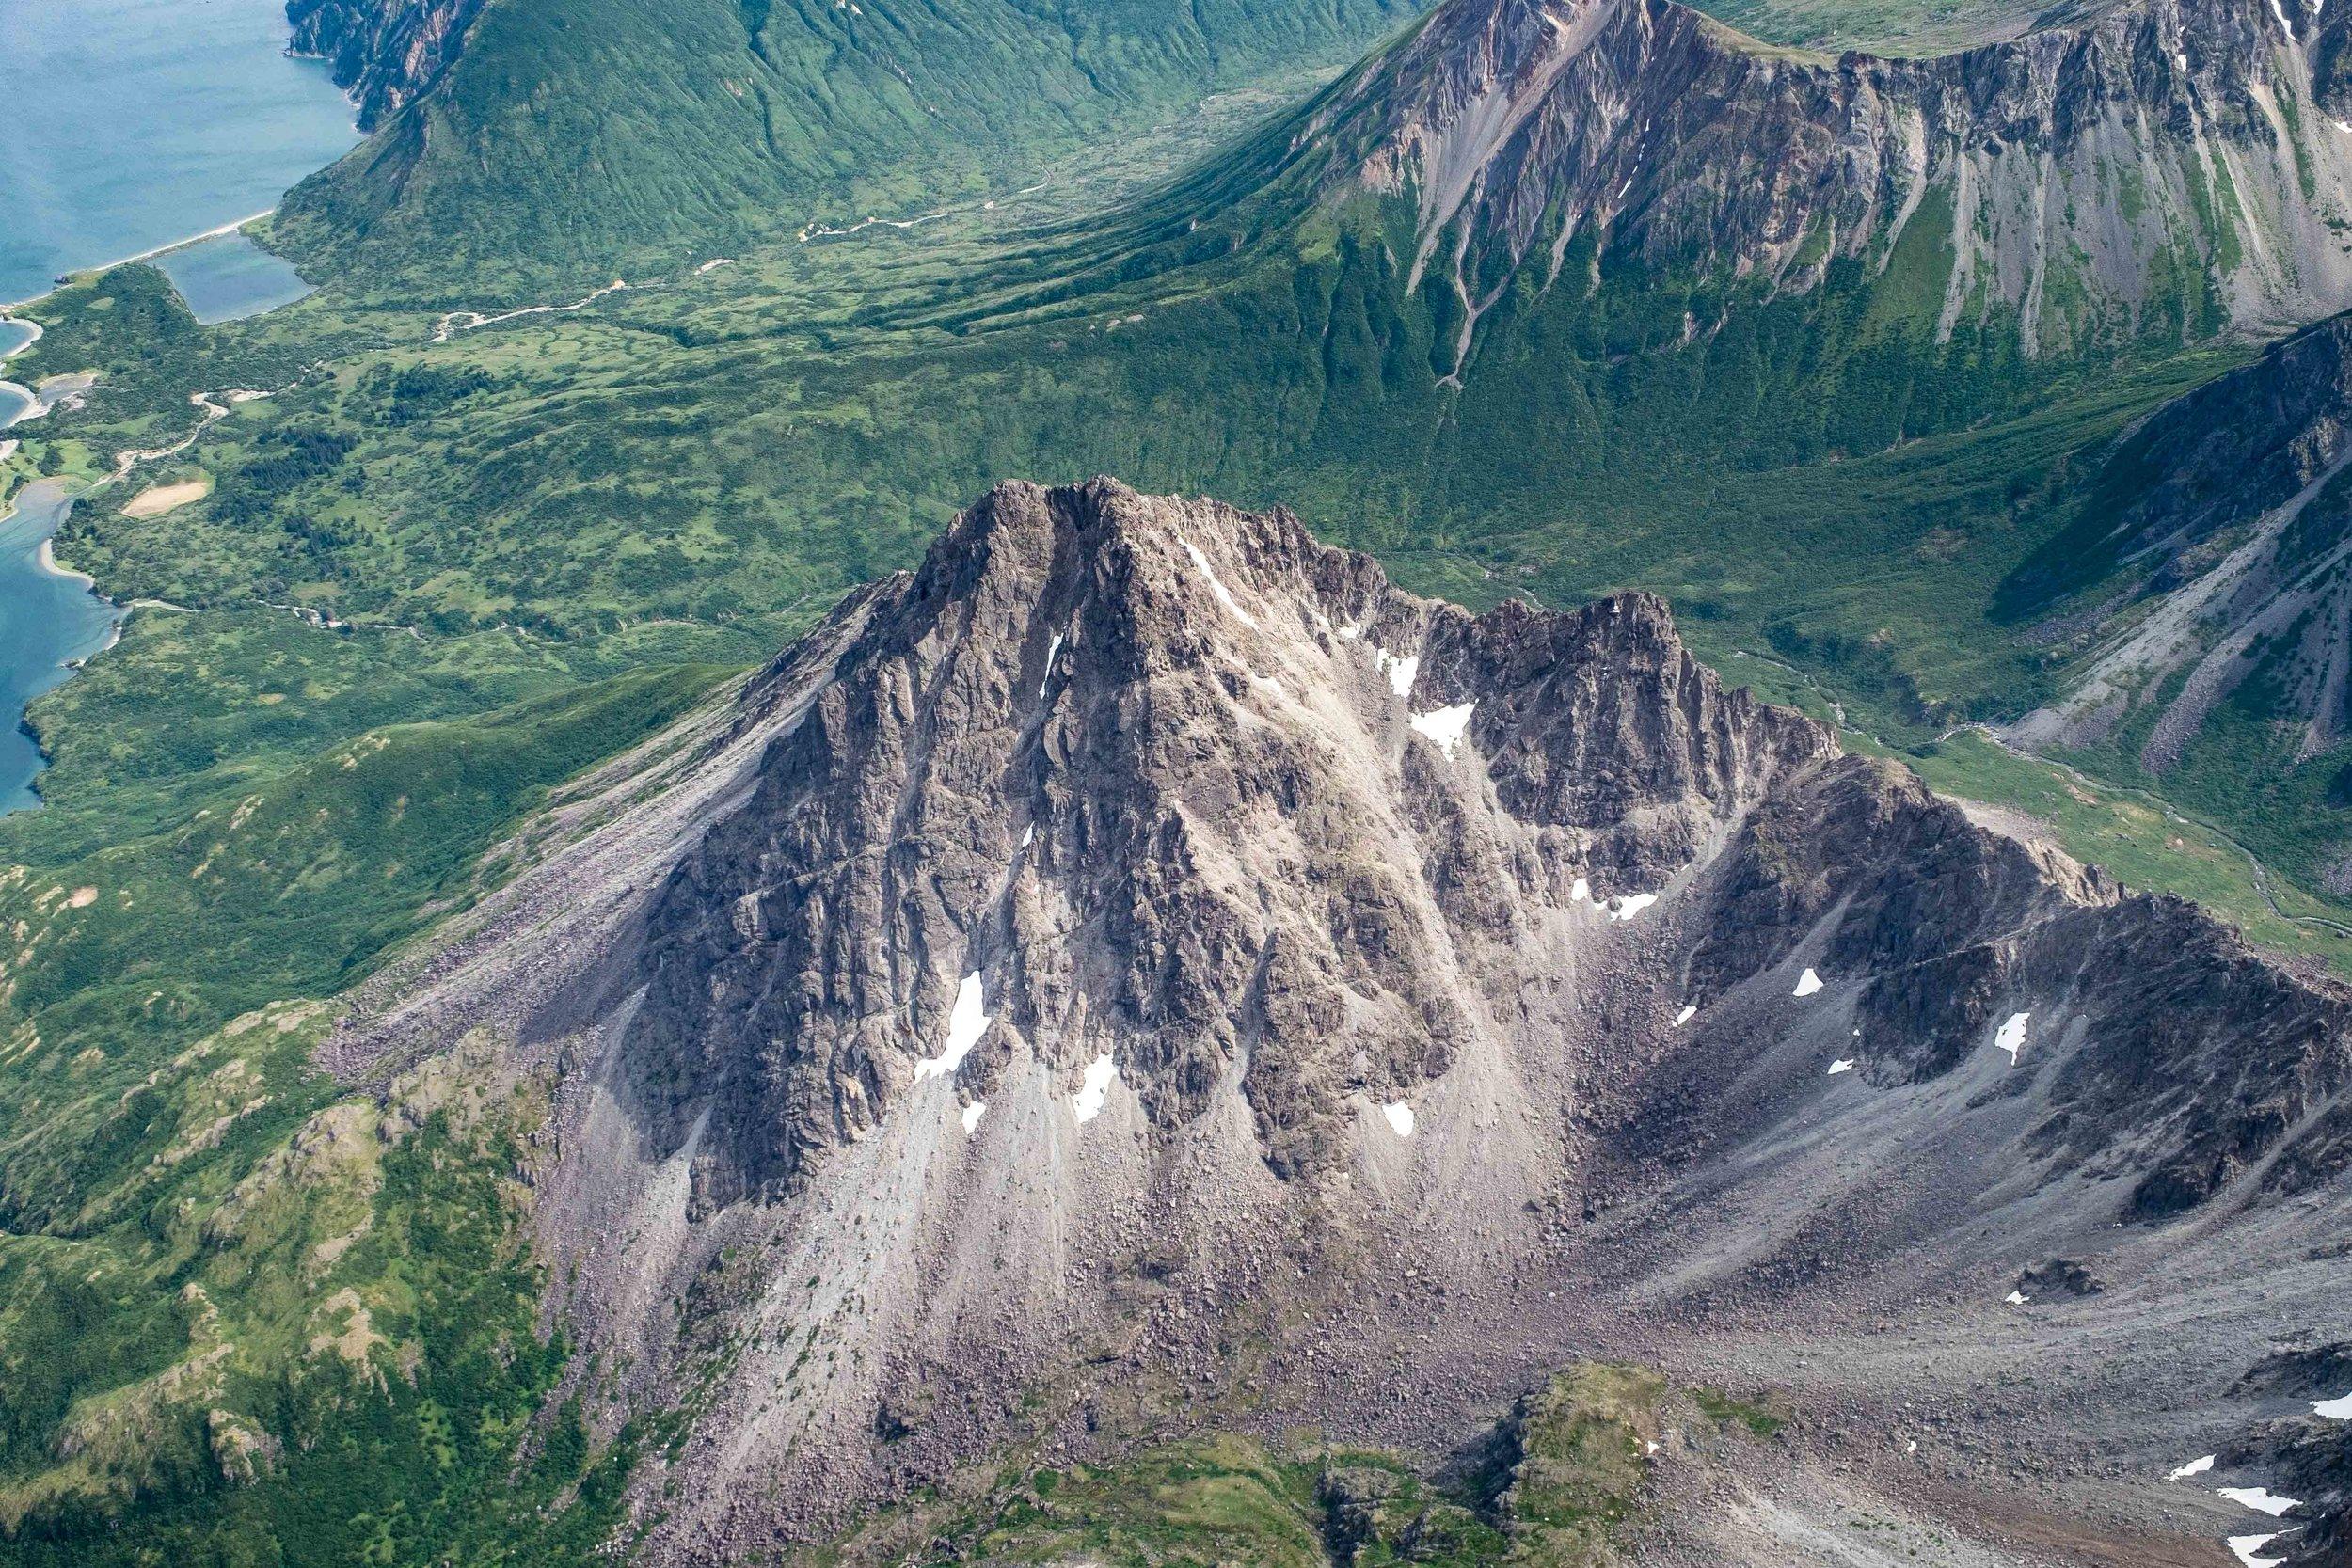 20160720-JI-Katmai National Park-_DSF3179-2.jpg